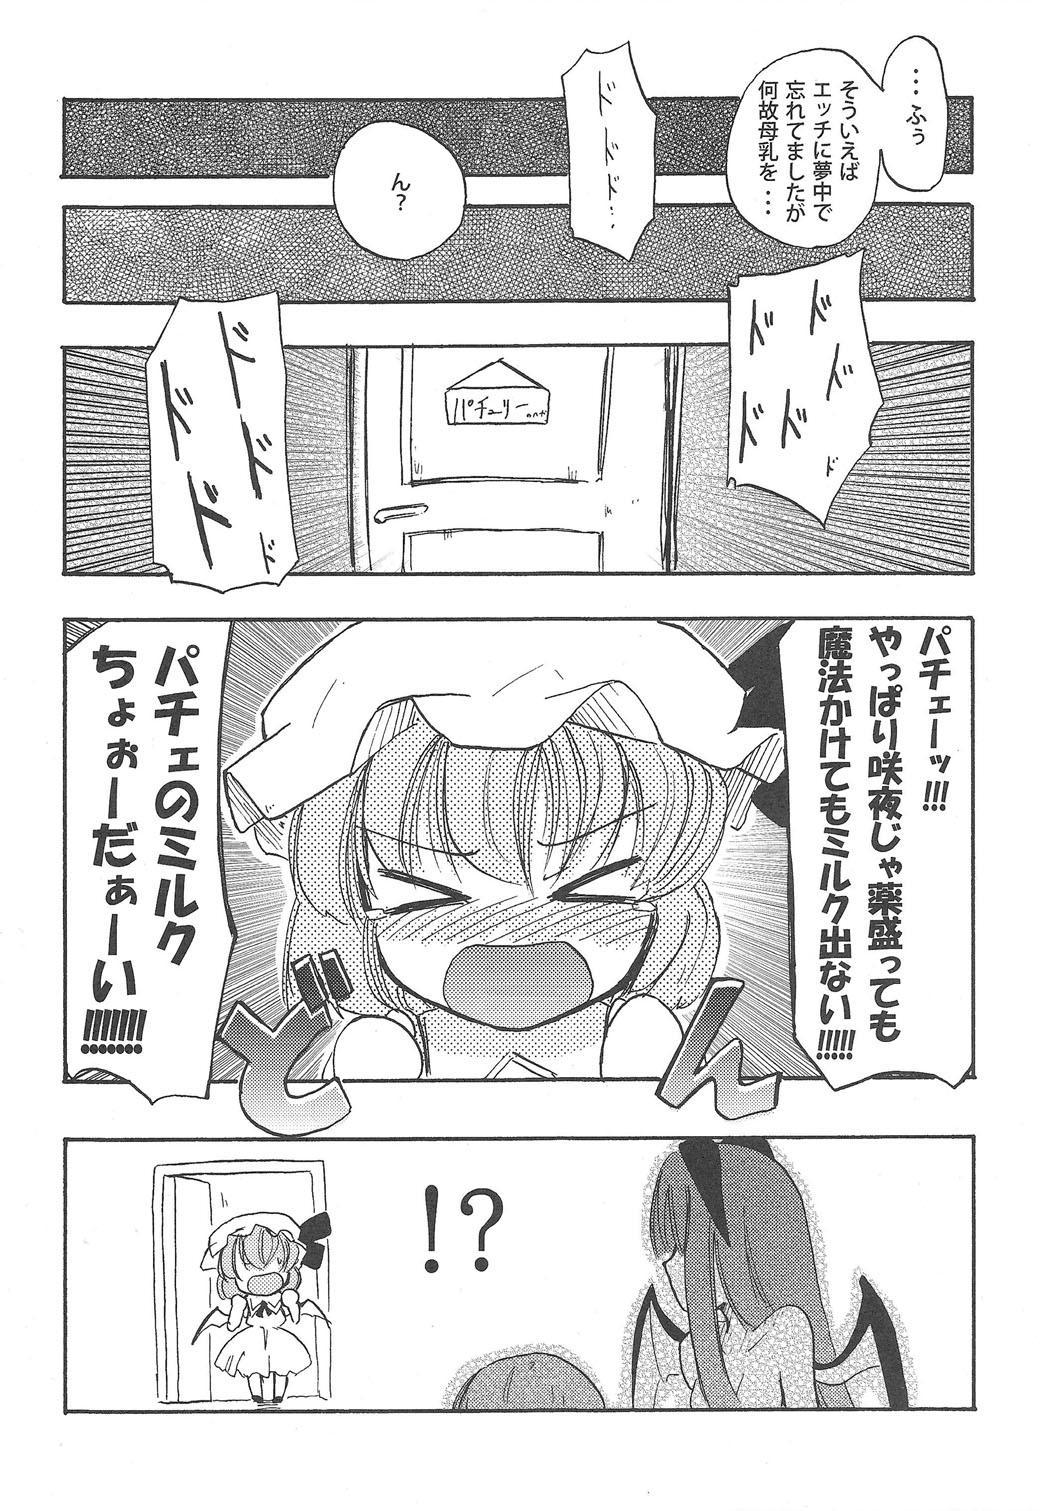 Homuraya Milk ★ Collection 29